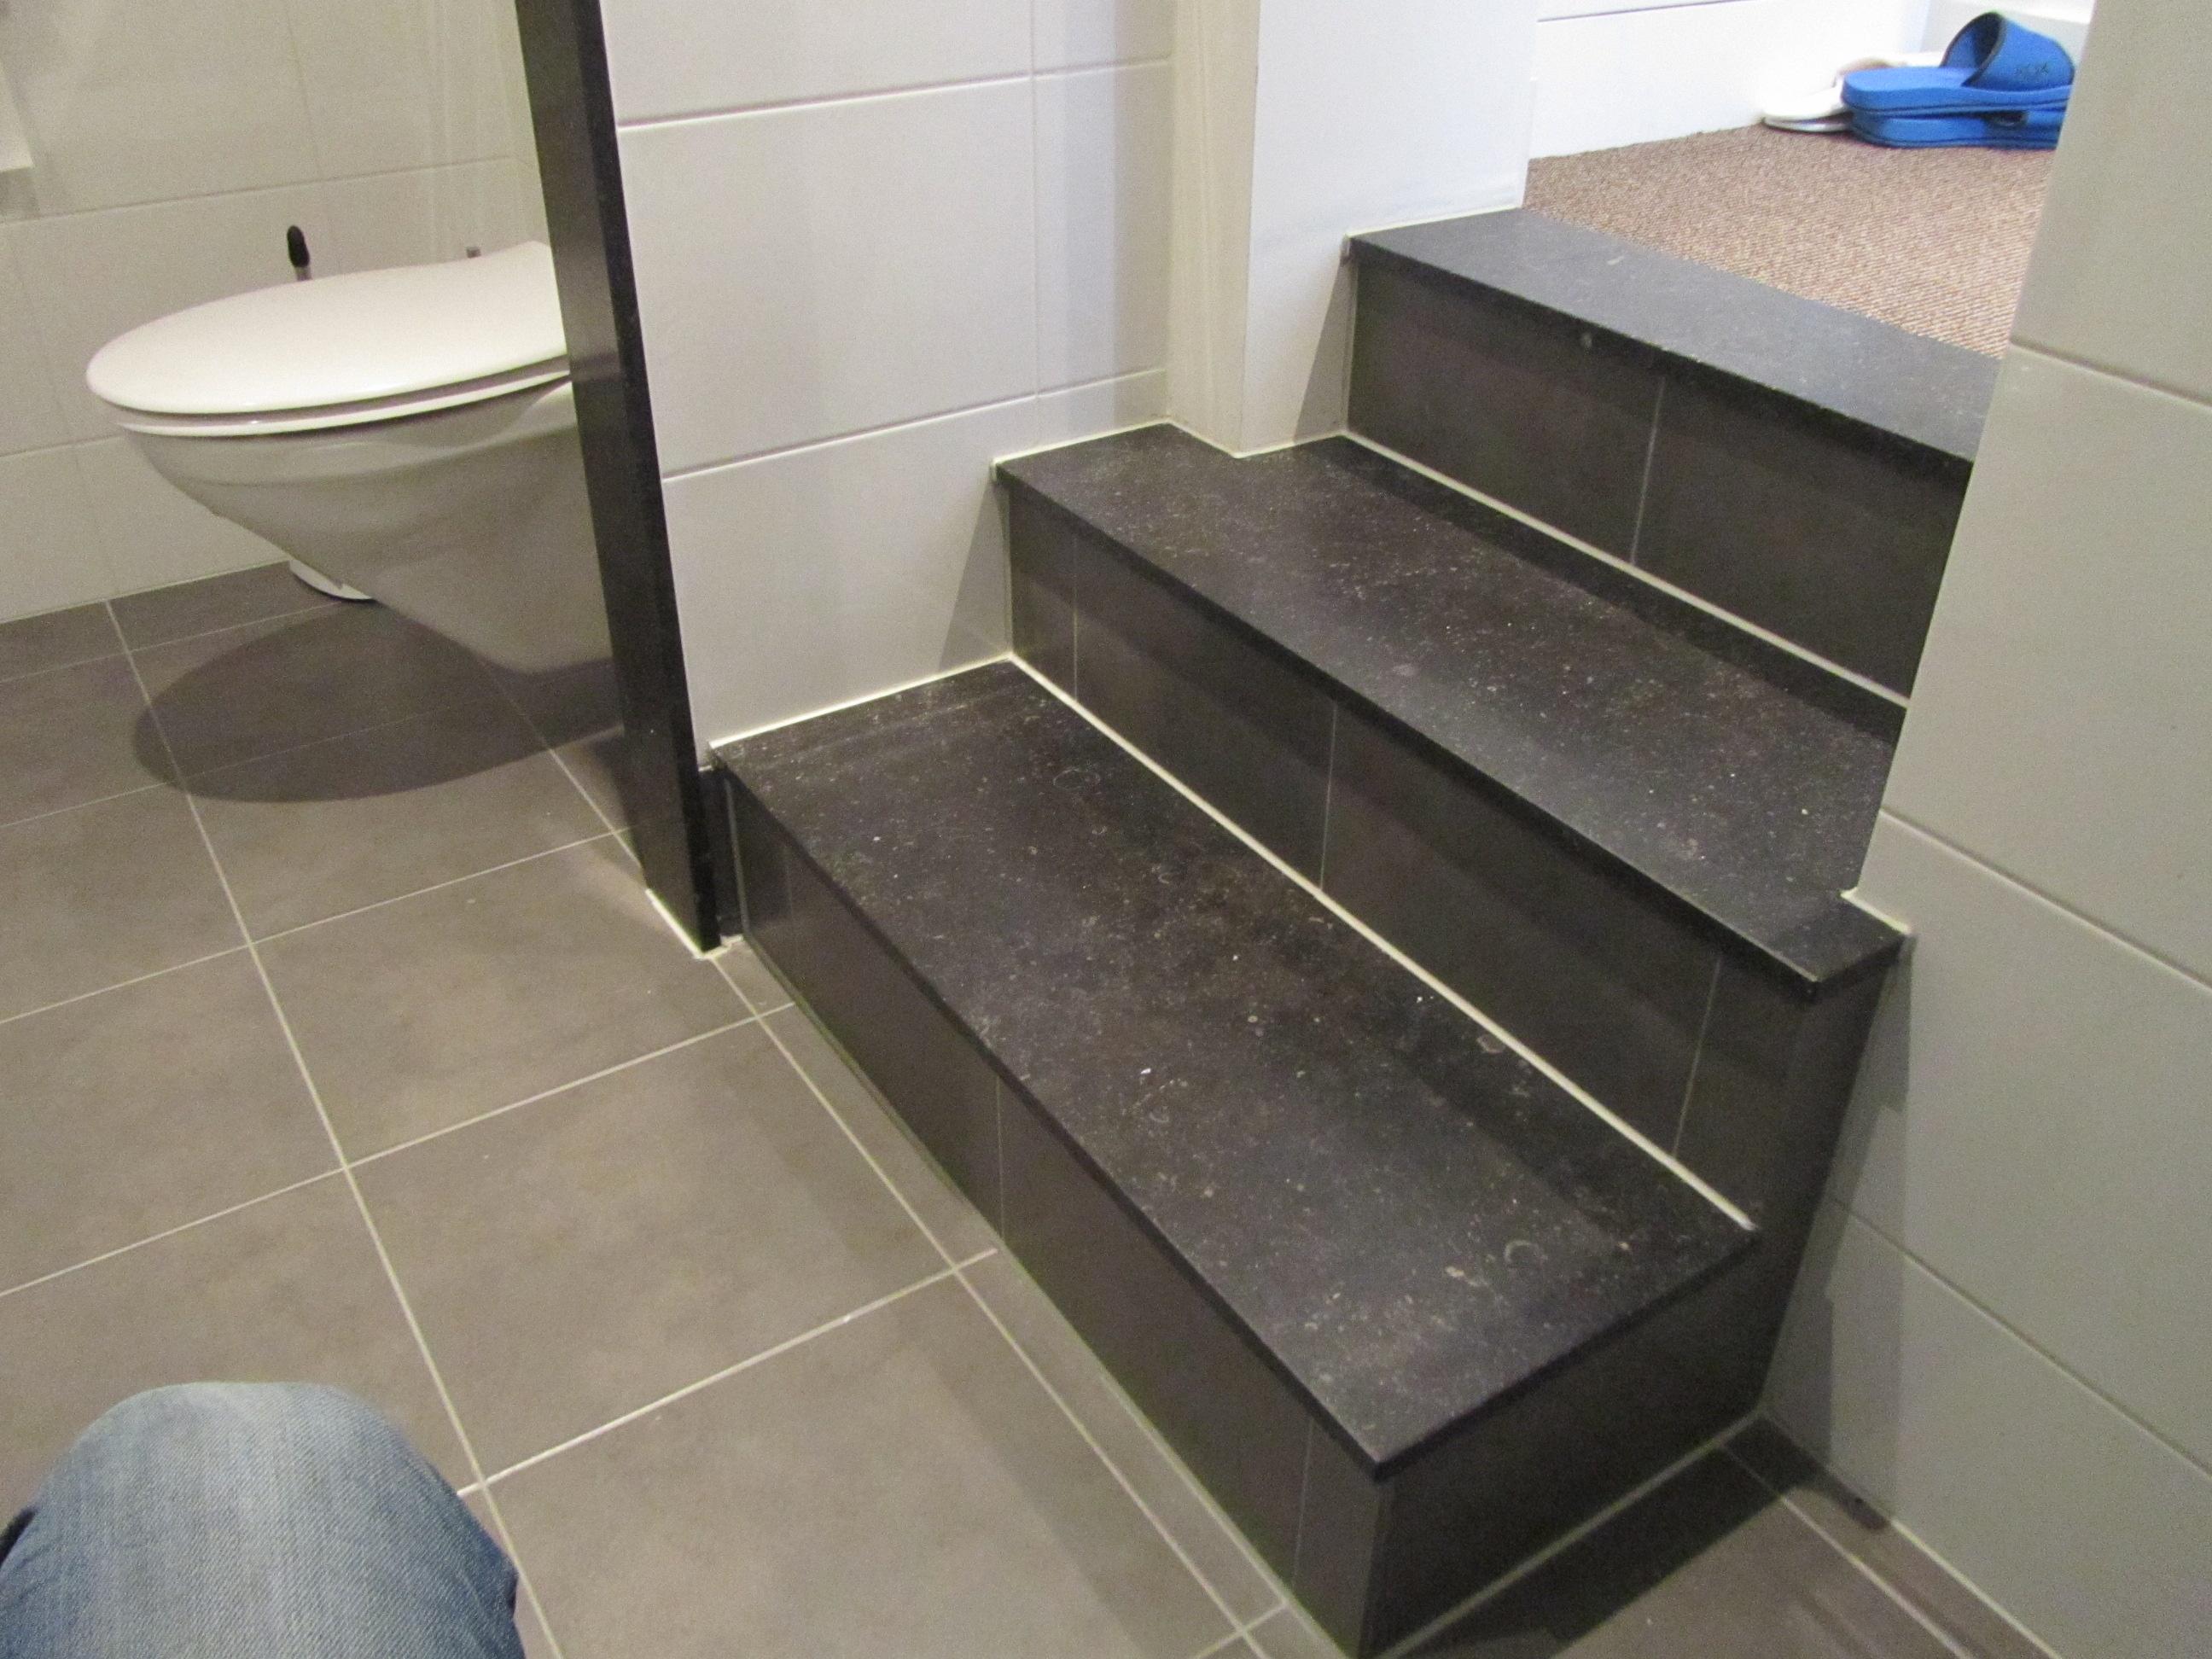 13 trap in badkamer nieuw | RR Bouwadvies